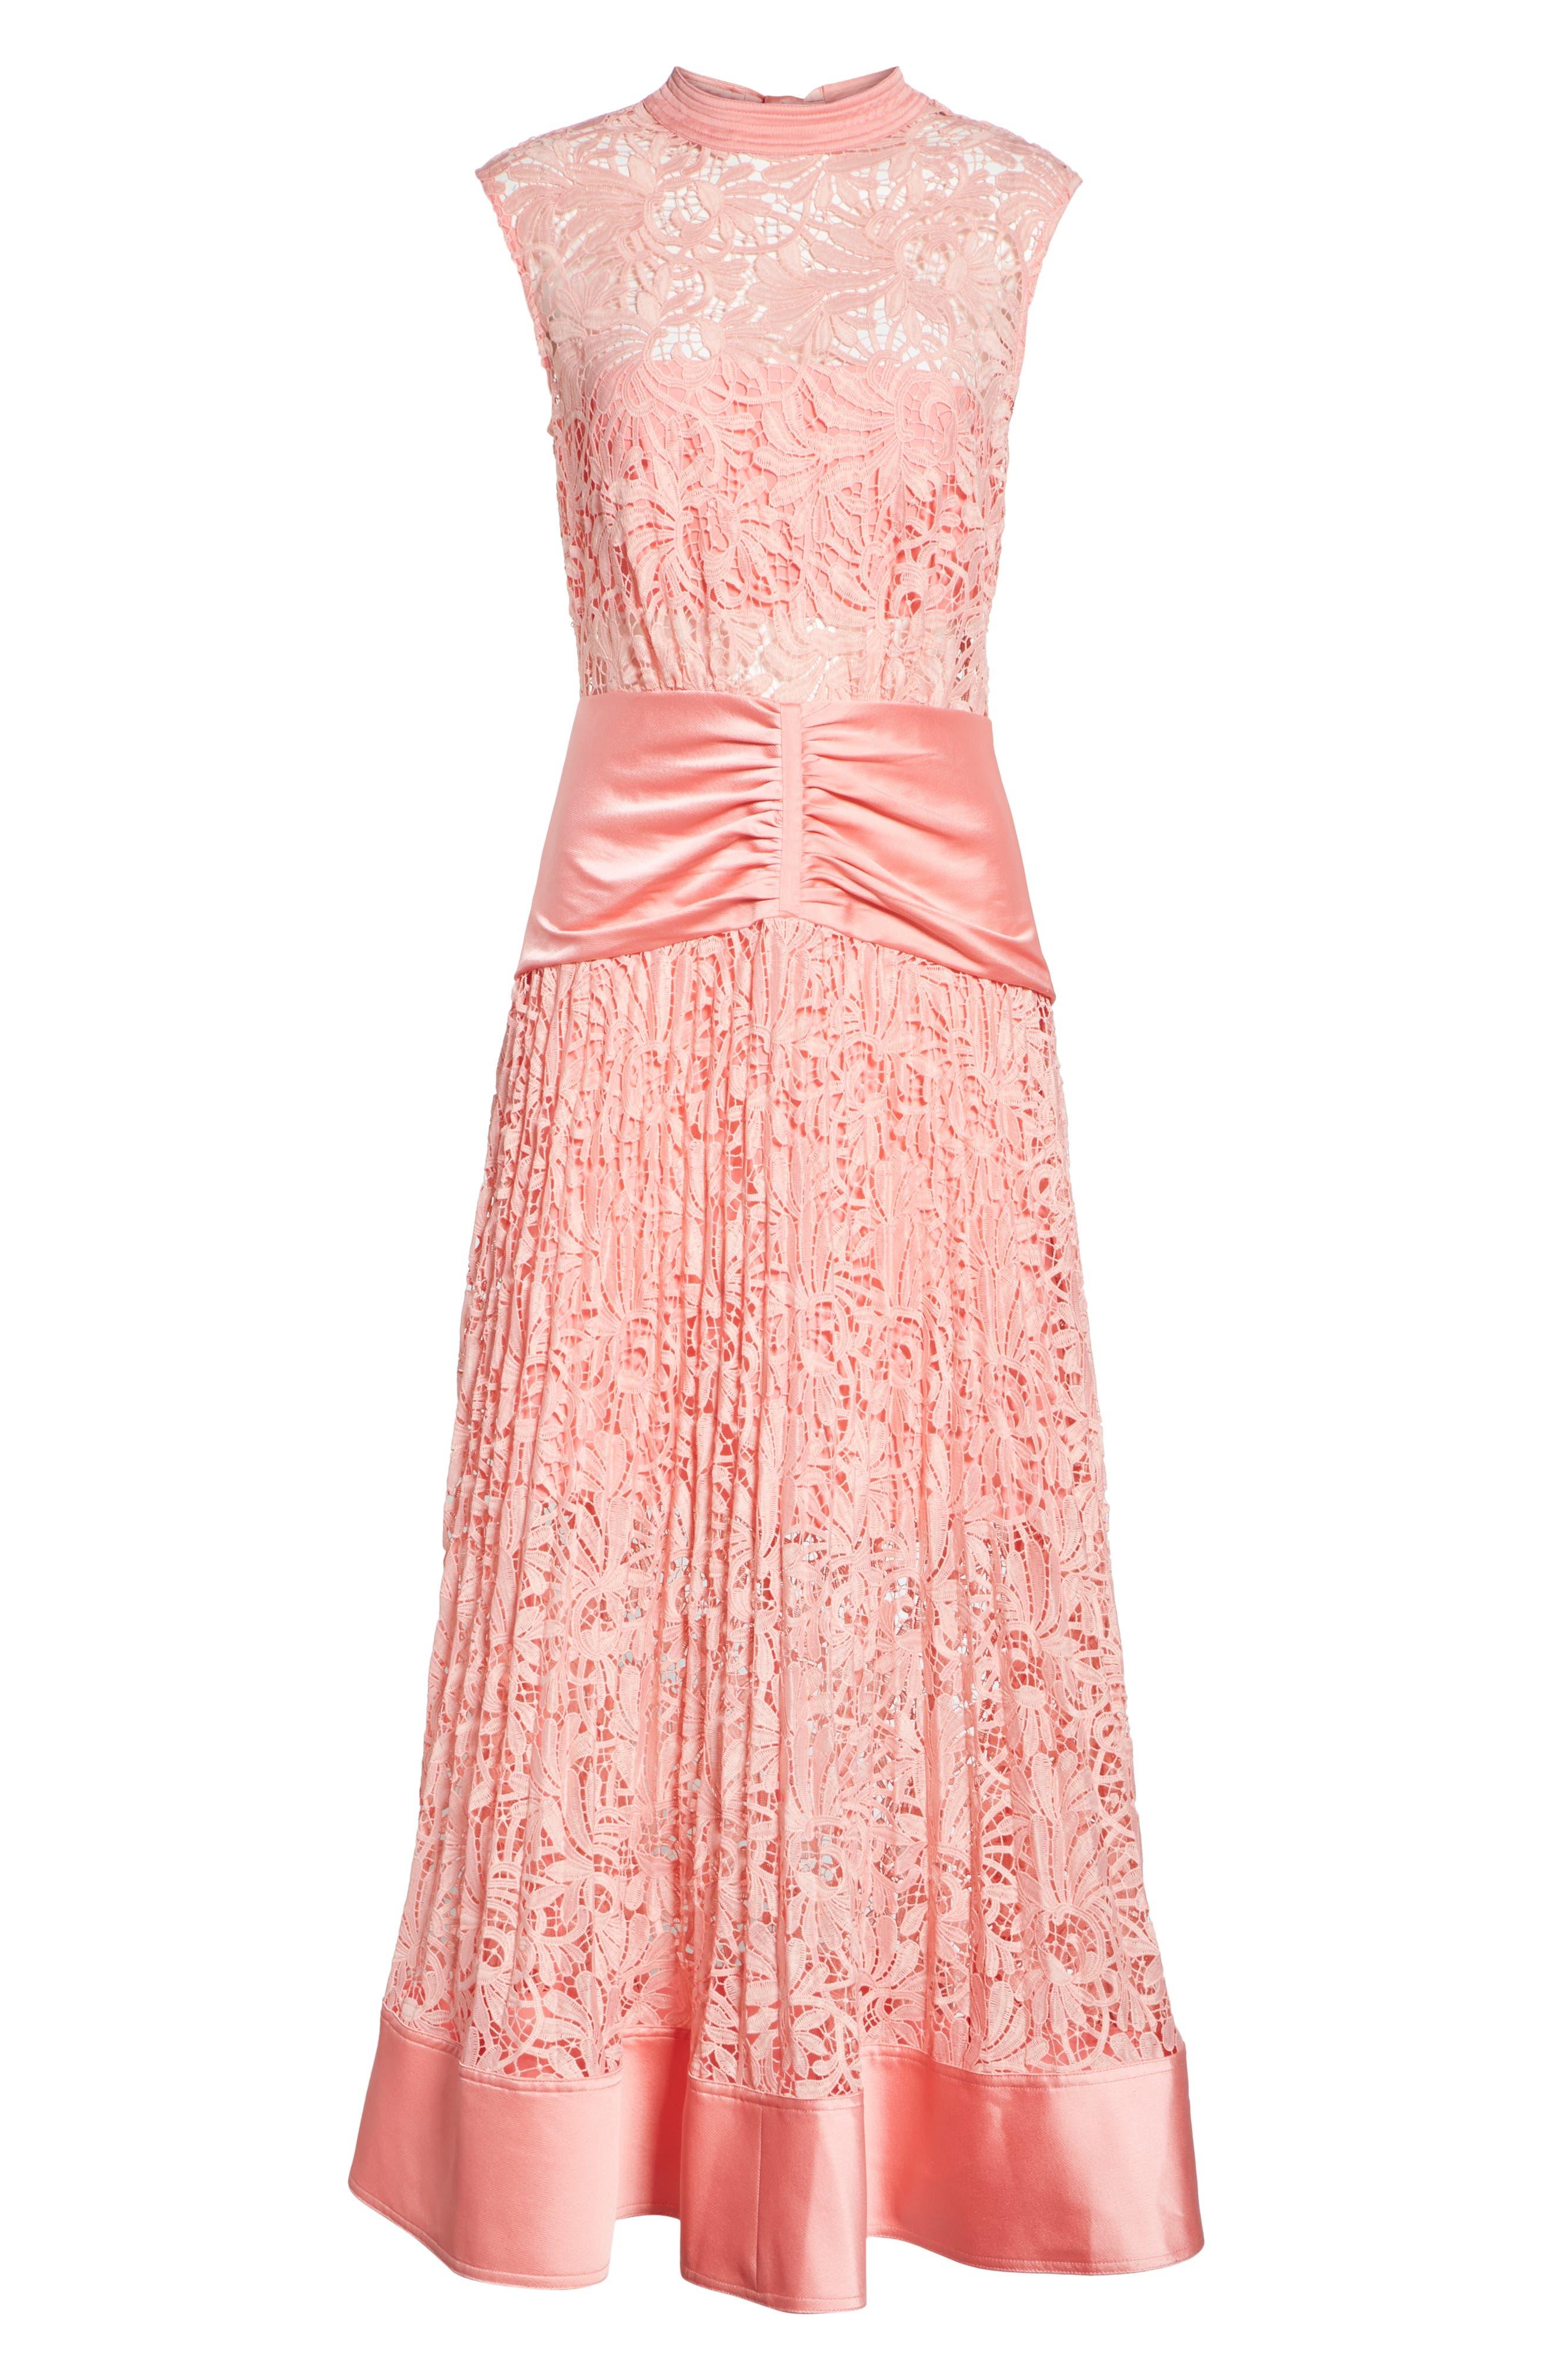 Floral Lace Sleeveless Midi Dress,                             Alternate thumbnail 7, color,                             650